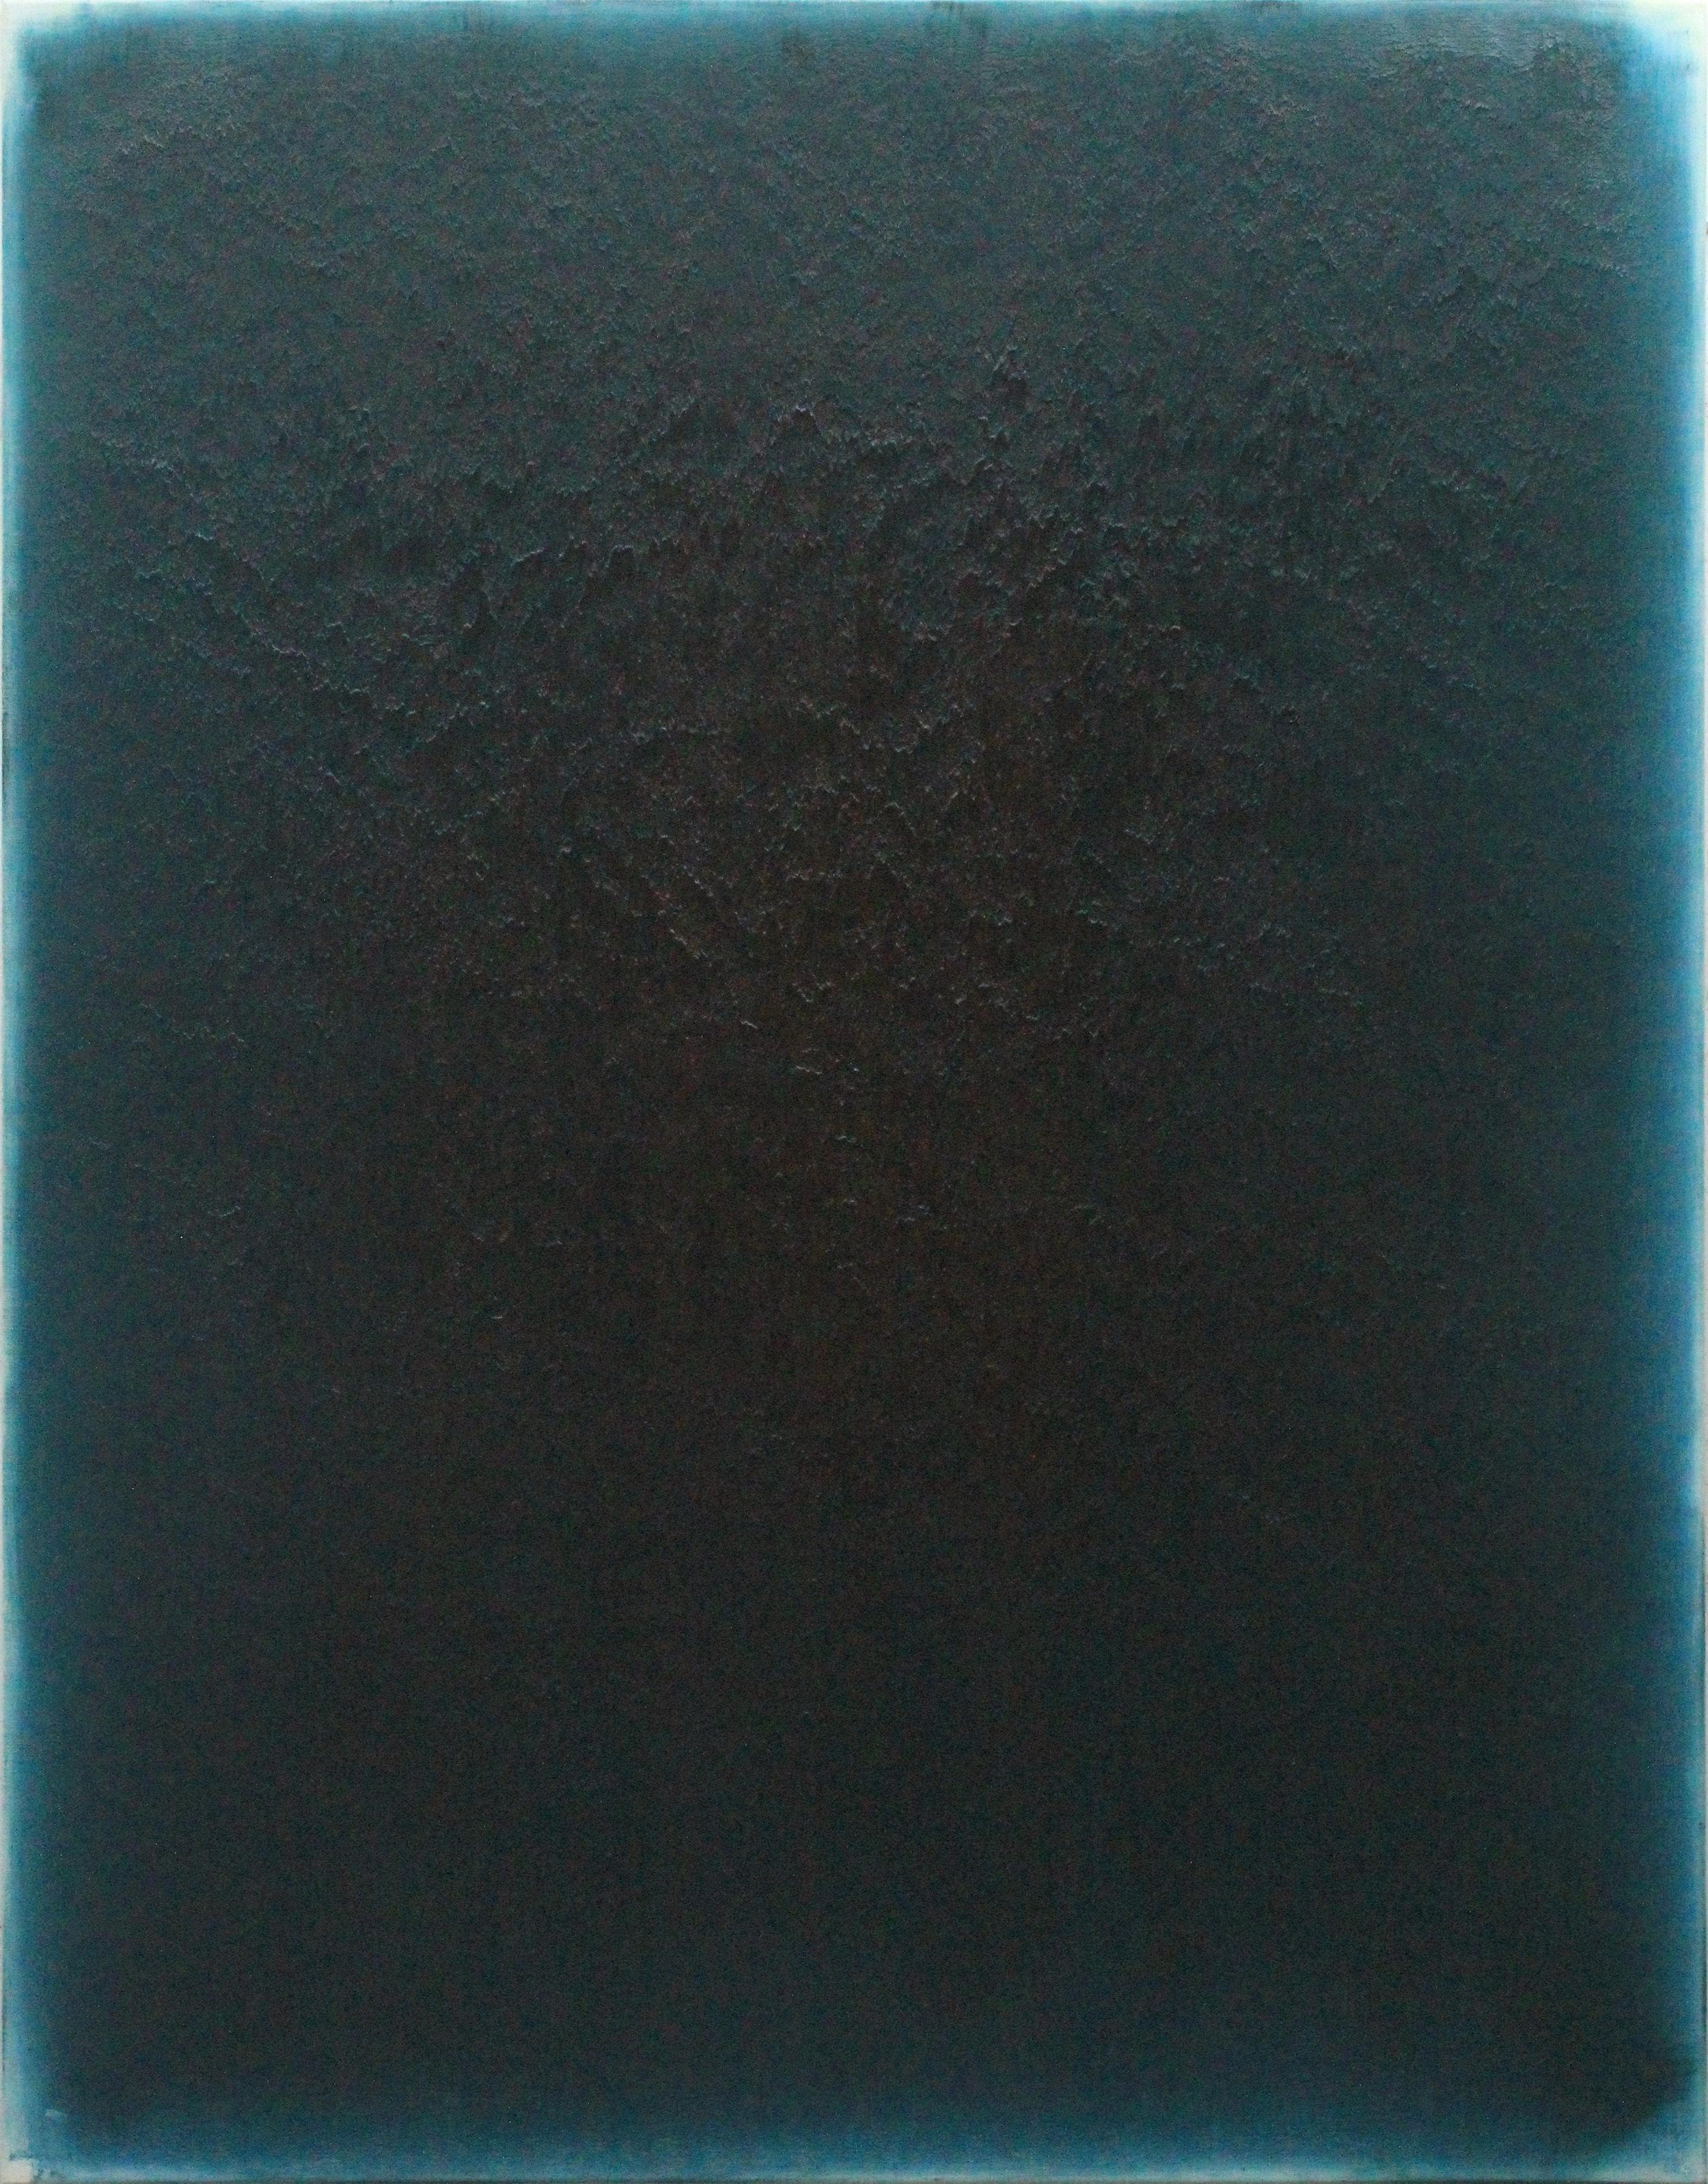 'Very Painting', 2017, oil on canvas, 180 x 140 cm (1).jpg